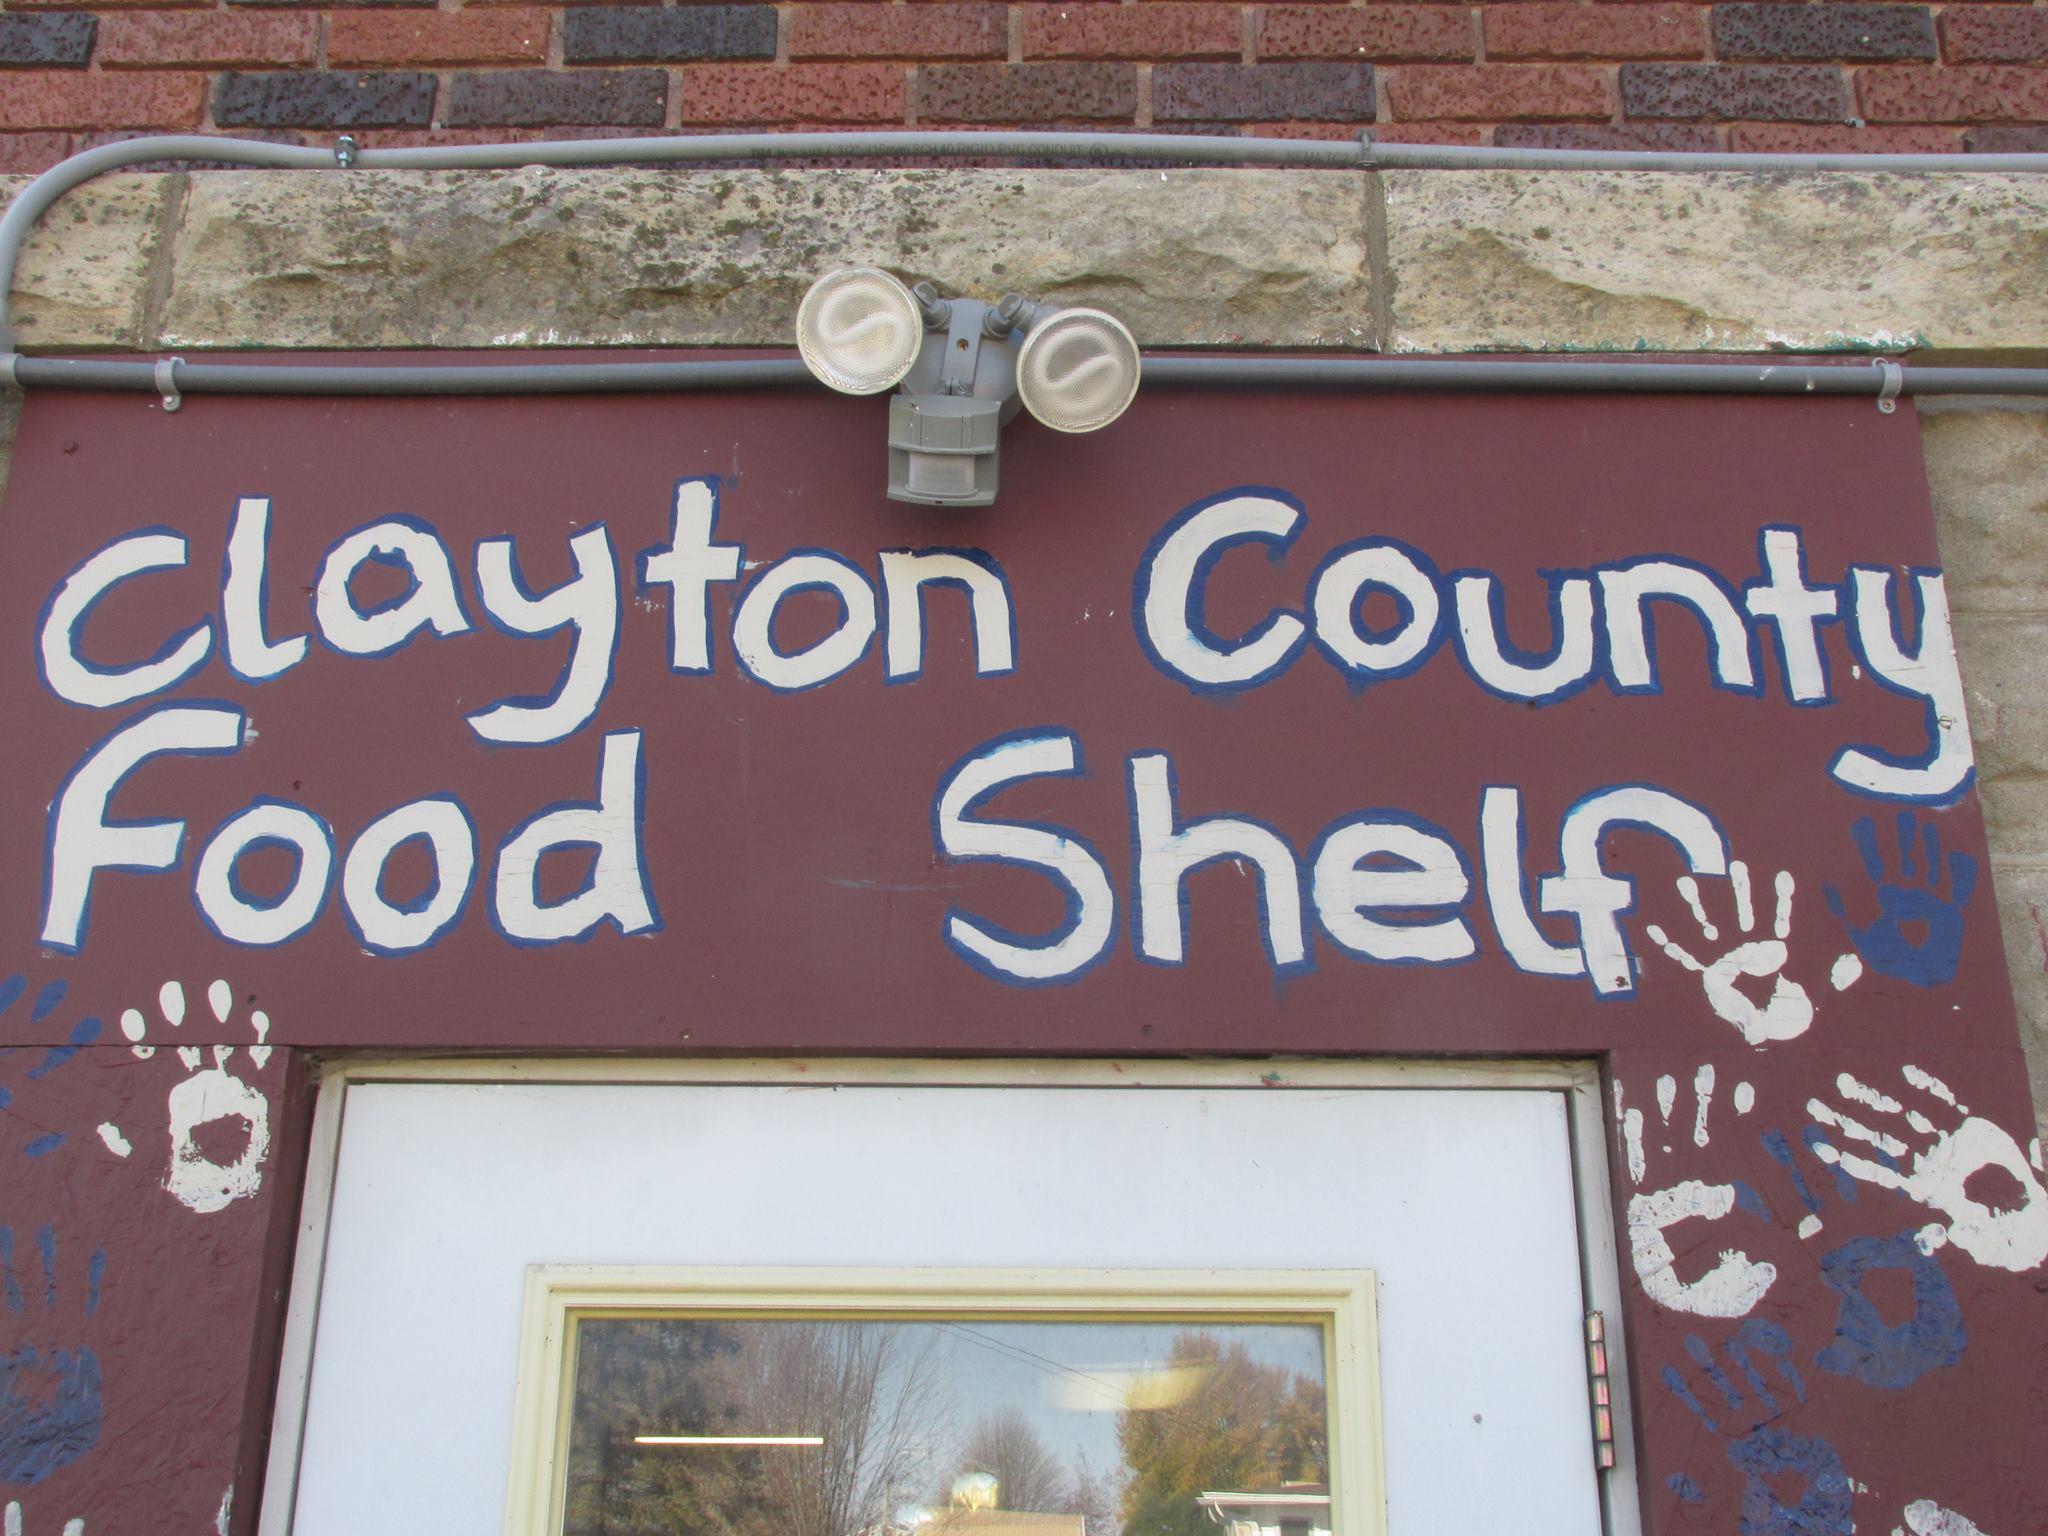 Clayton County Food Shelf